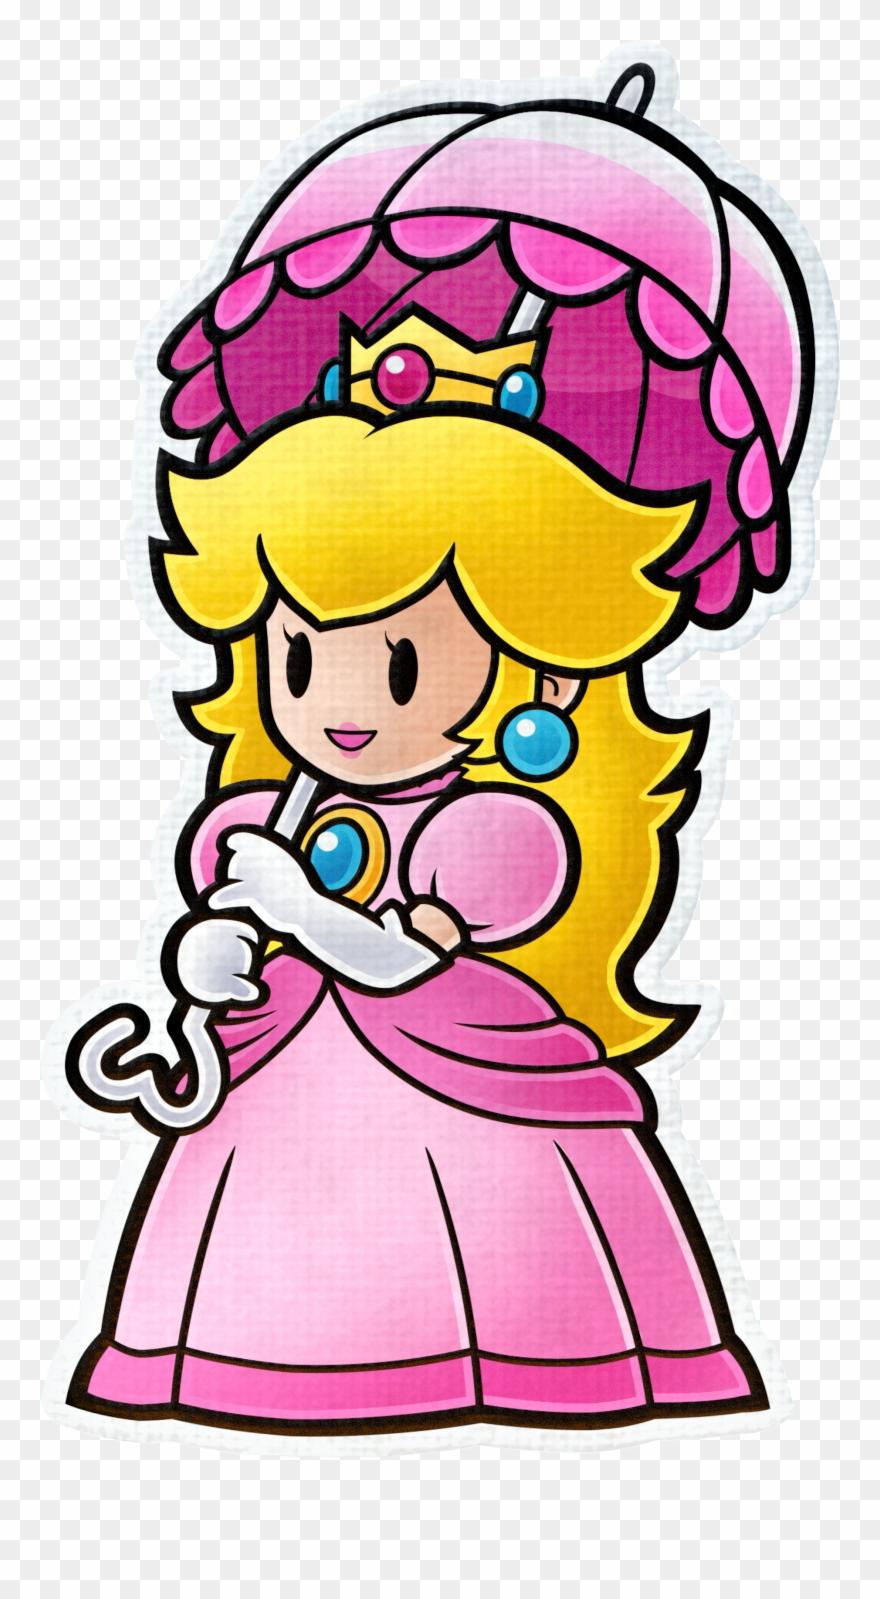 Princess Peach Paper Mario Color Splash Characters Clipart